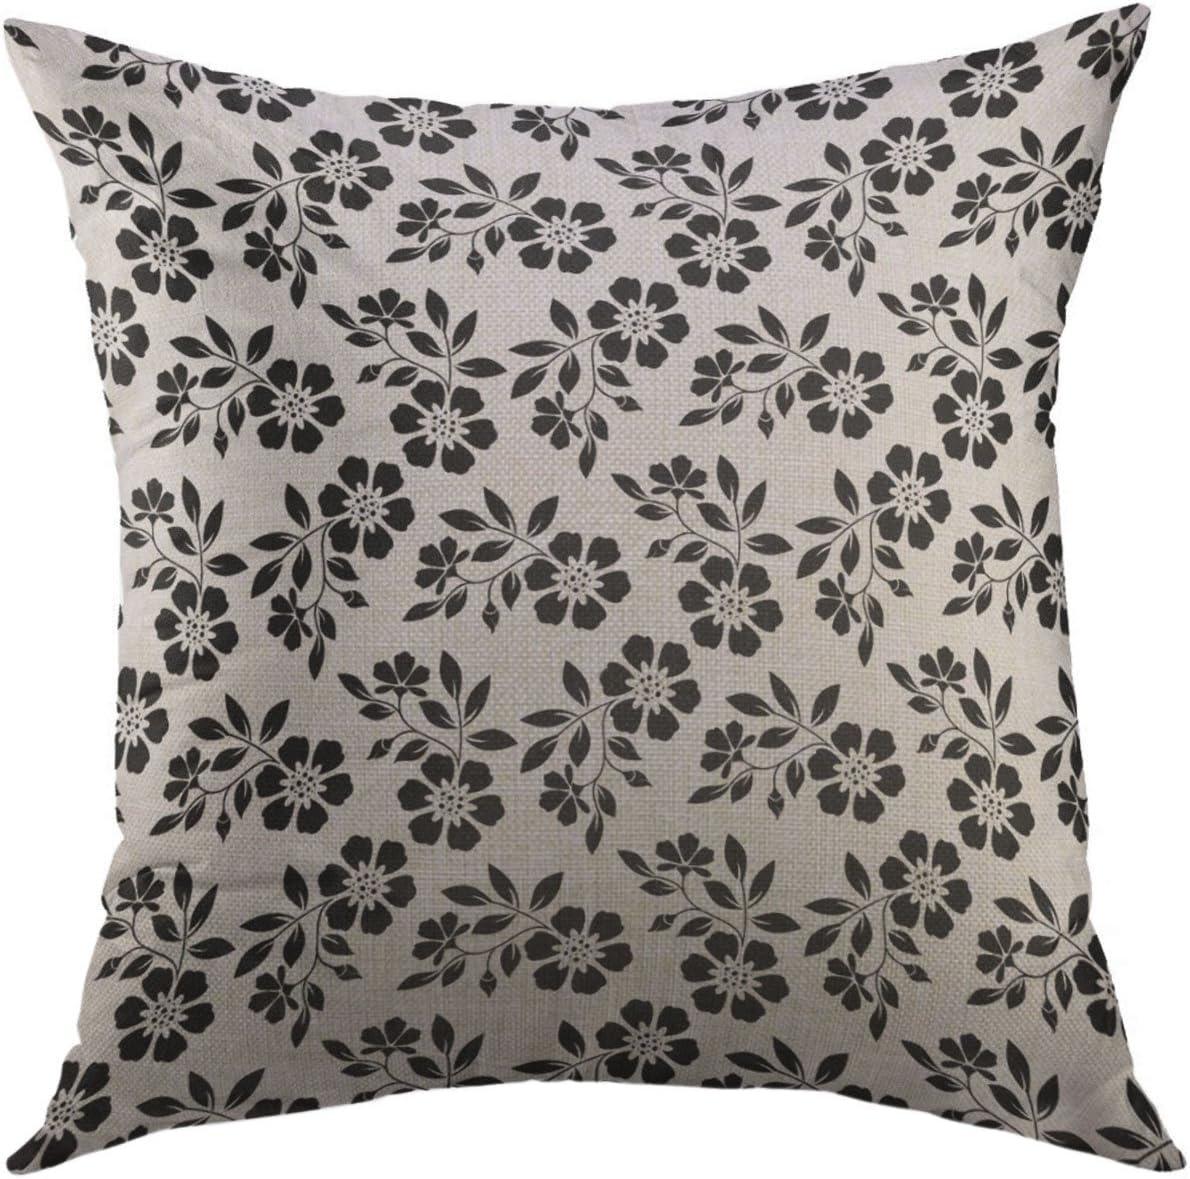 Mugod Pillow Cover Black Graphic